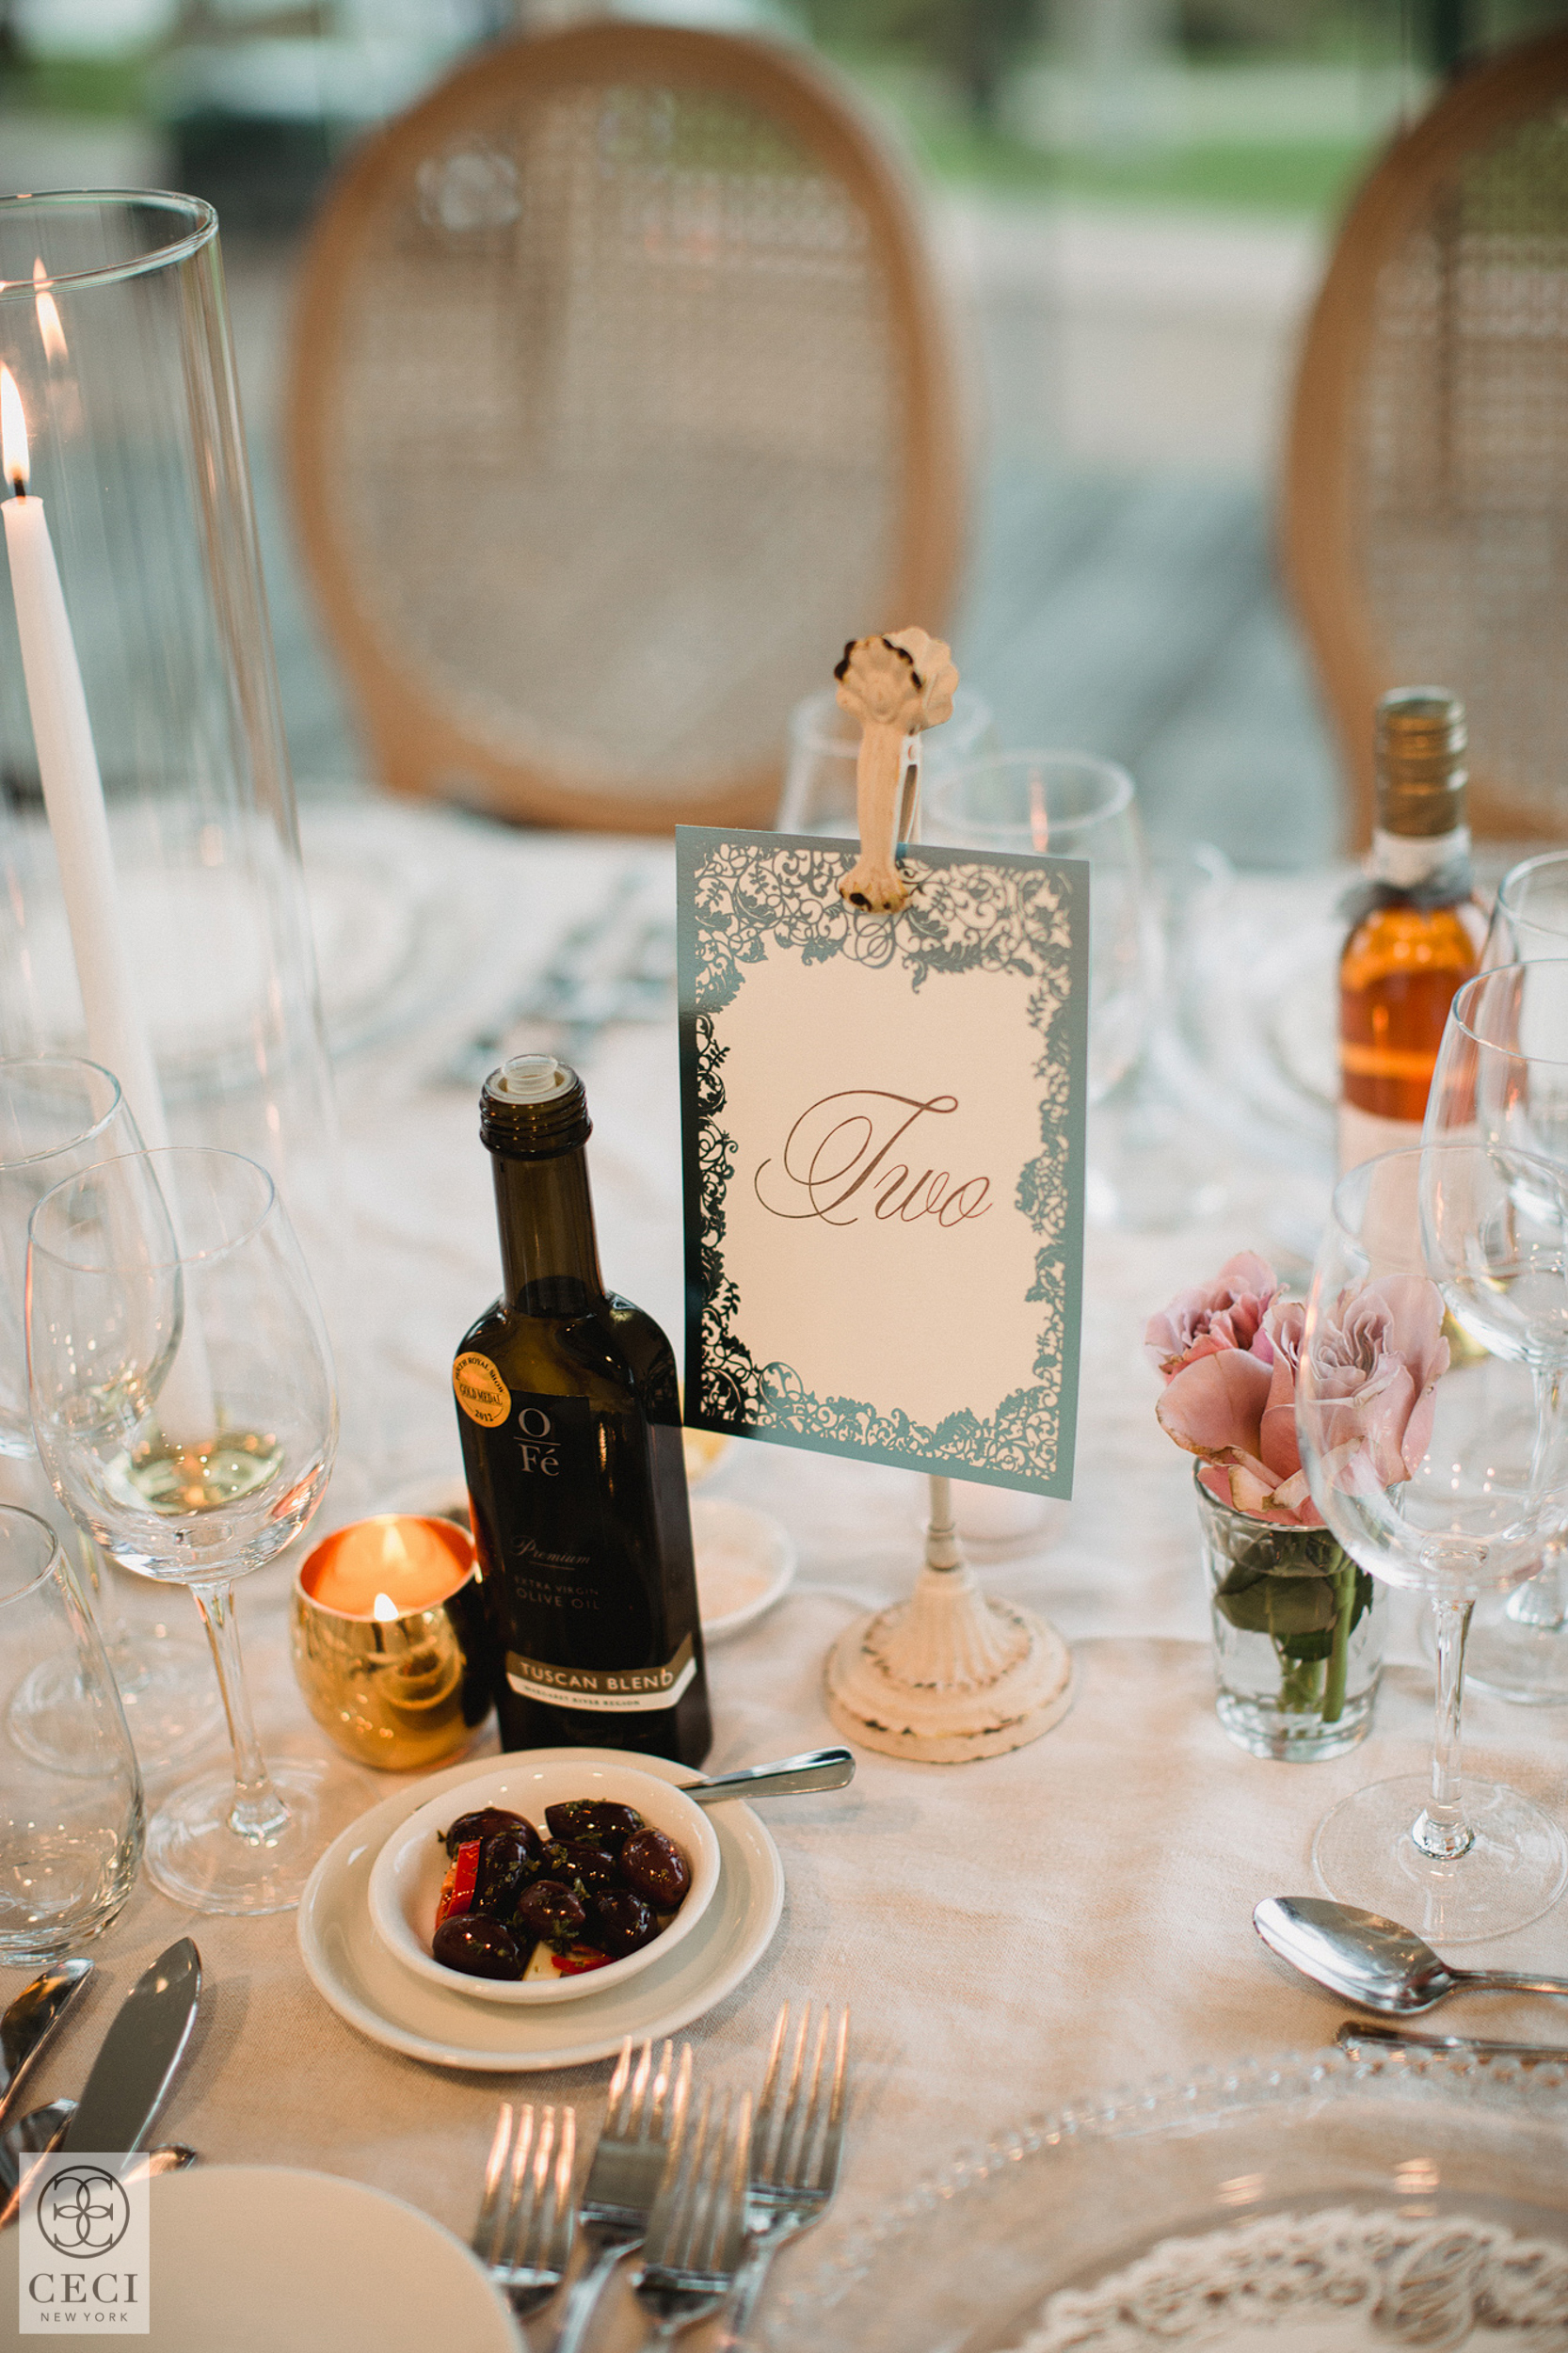 Ceci_New_York_Custom_Luxury_Wedding_BeautyShot_LaserCut_Stationery_Personalized_Couture_Foil_Stamping_Perth_Destination_Australia_Chic_-17.jpg